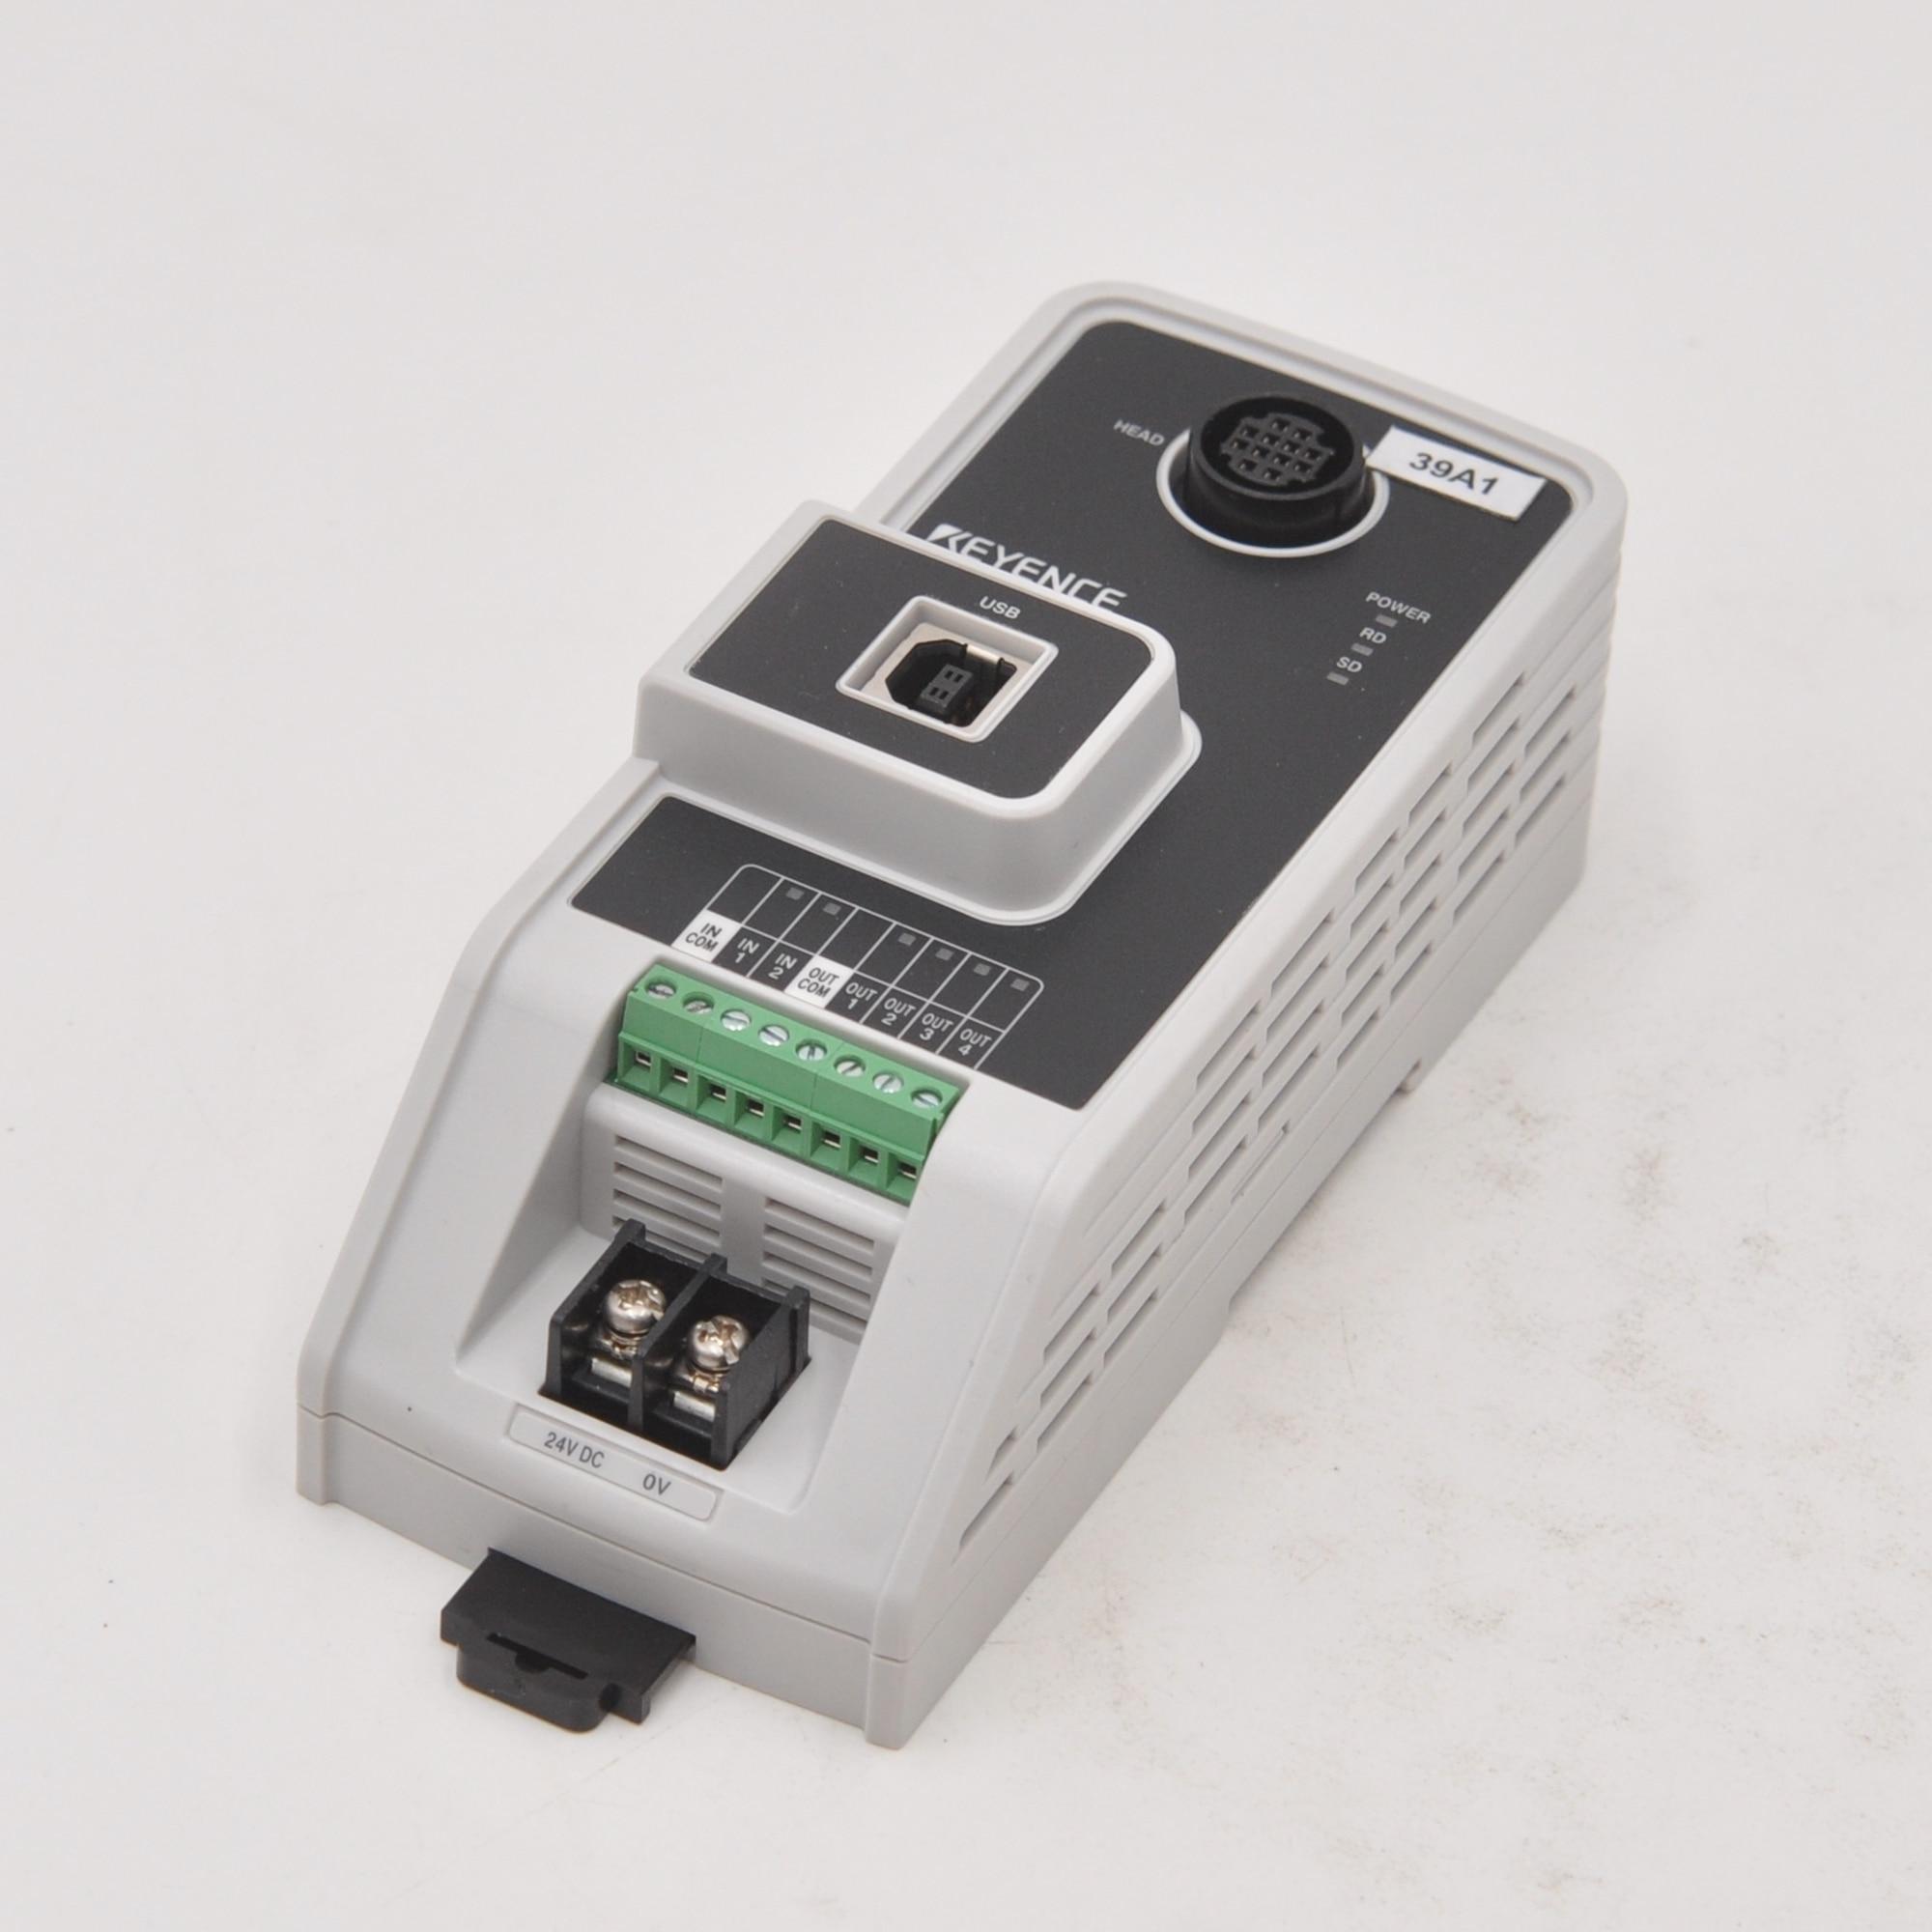 KEYENCE N-UB 24VDC SR-610 5VDC 2D barcode reader scanner enlarge